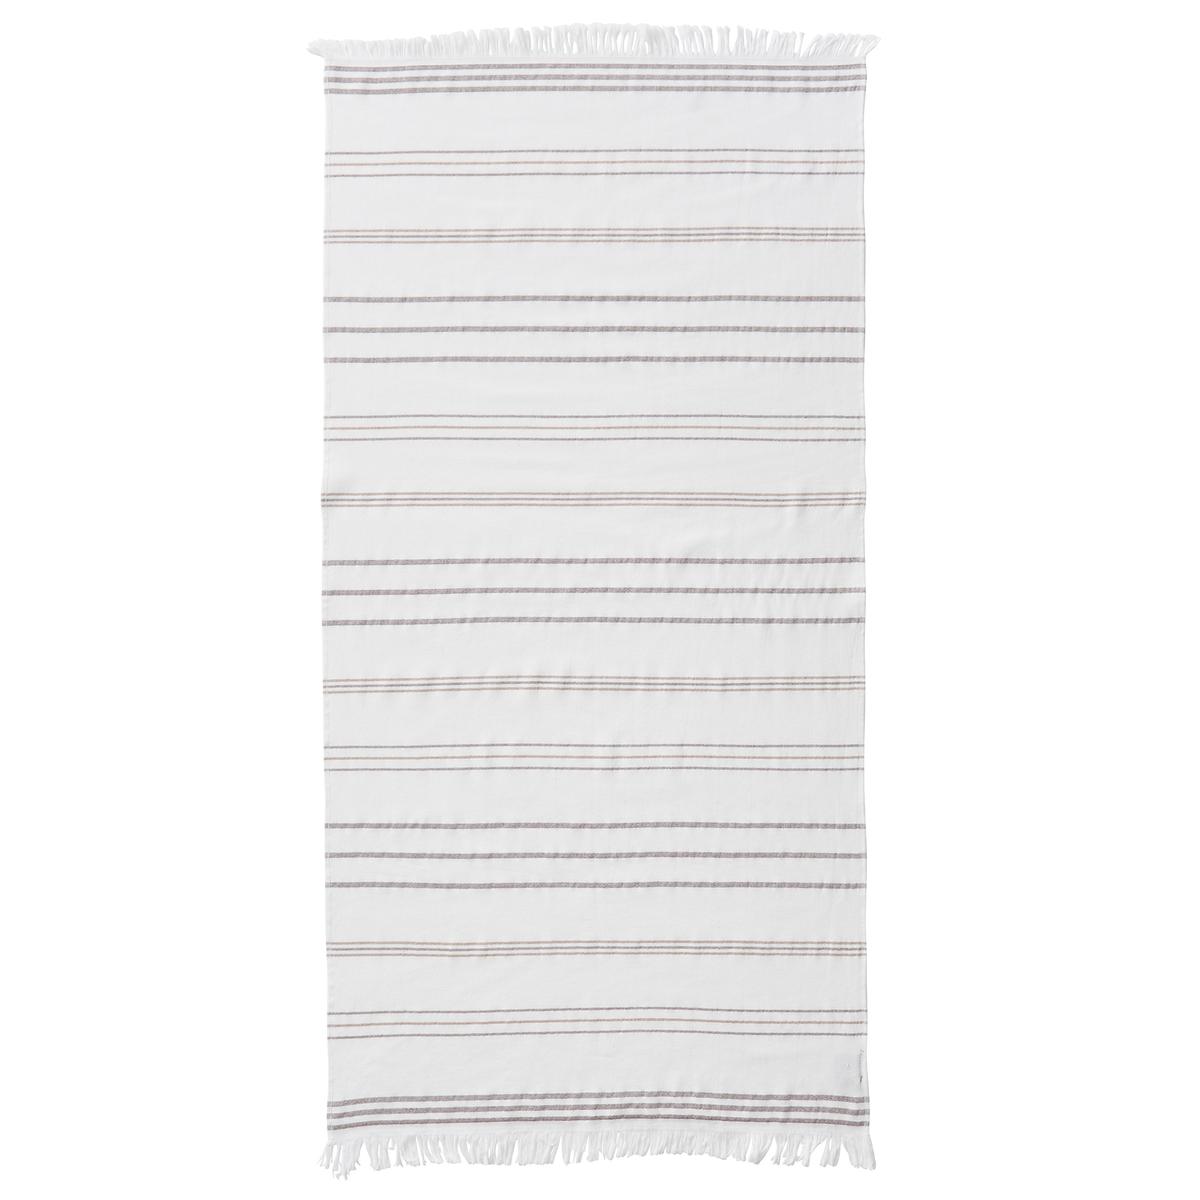 Полотенце пляжное Isparta полотенца банные la pastel полотенце праздник 70х140